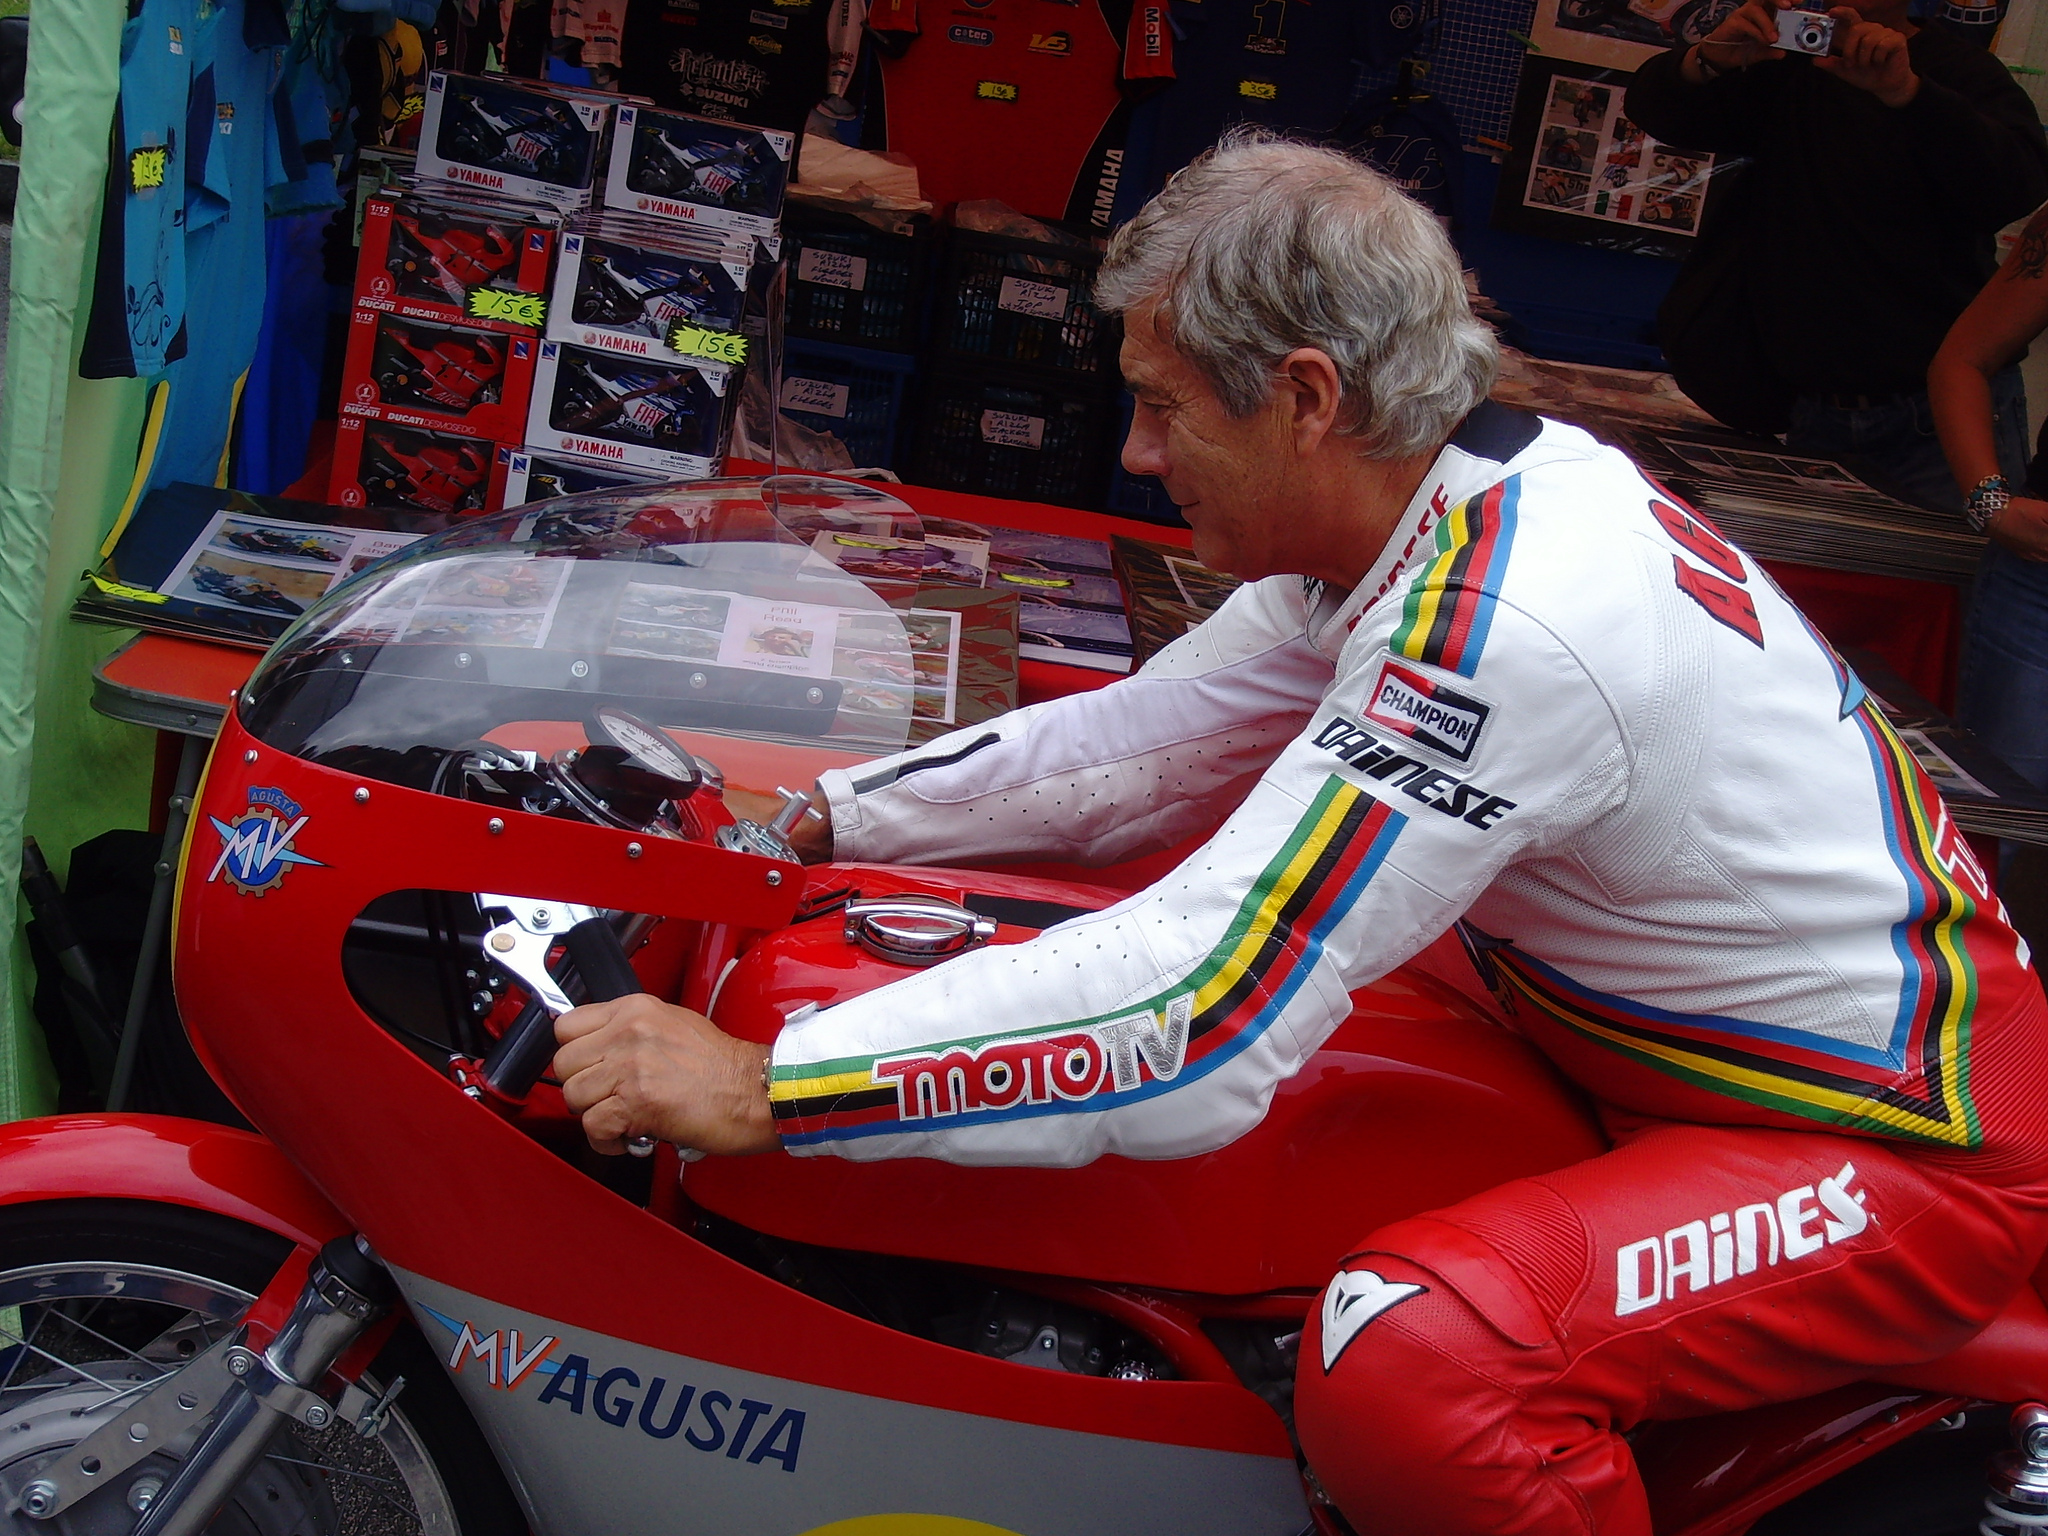 Giacomo Agostini image credit Klaus Nahr on flickr.jpg